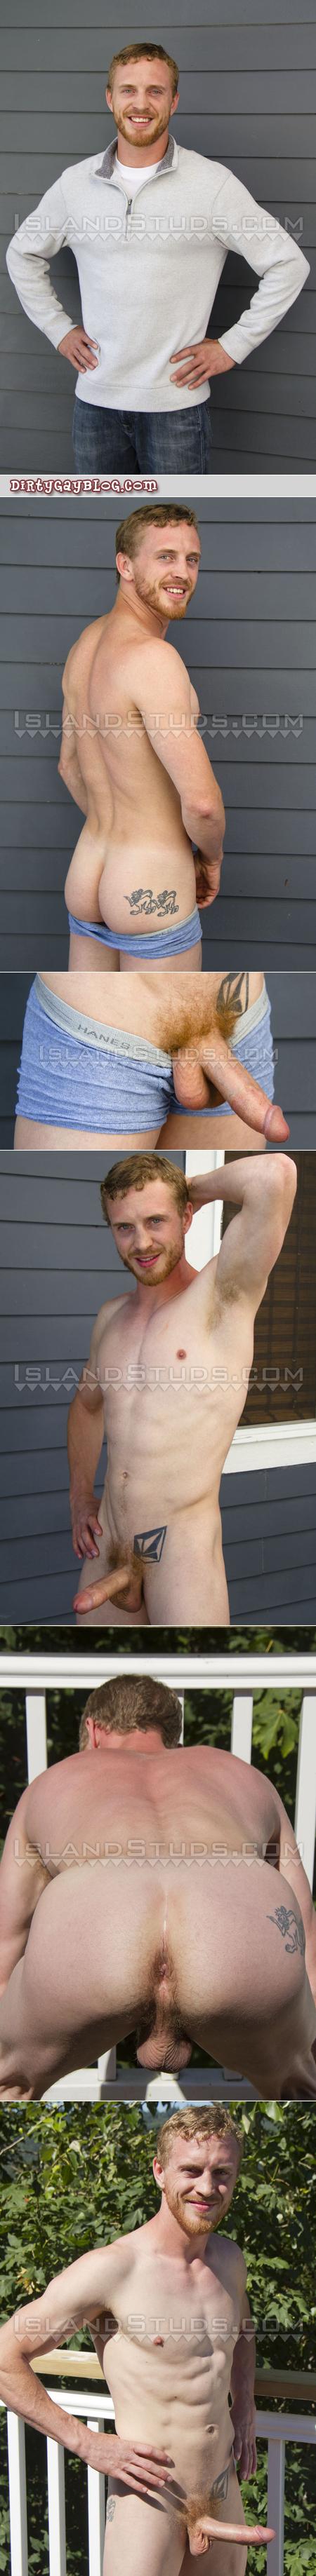 Muscular ginger man nude.